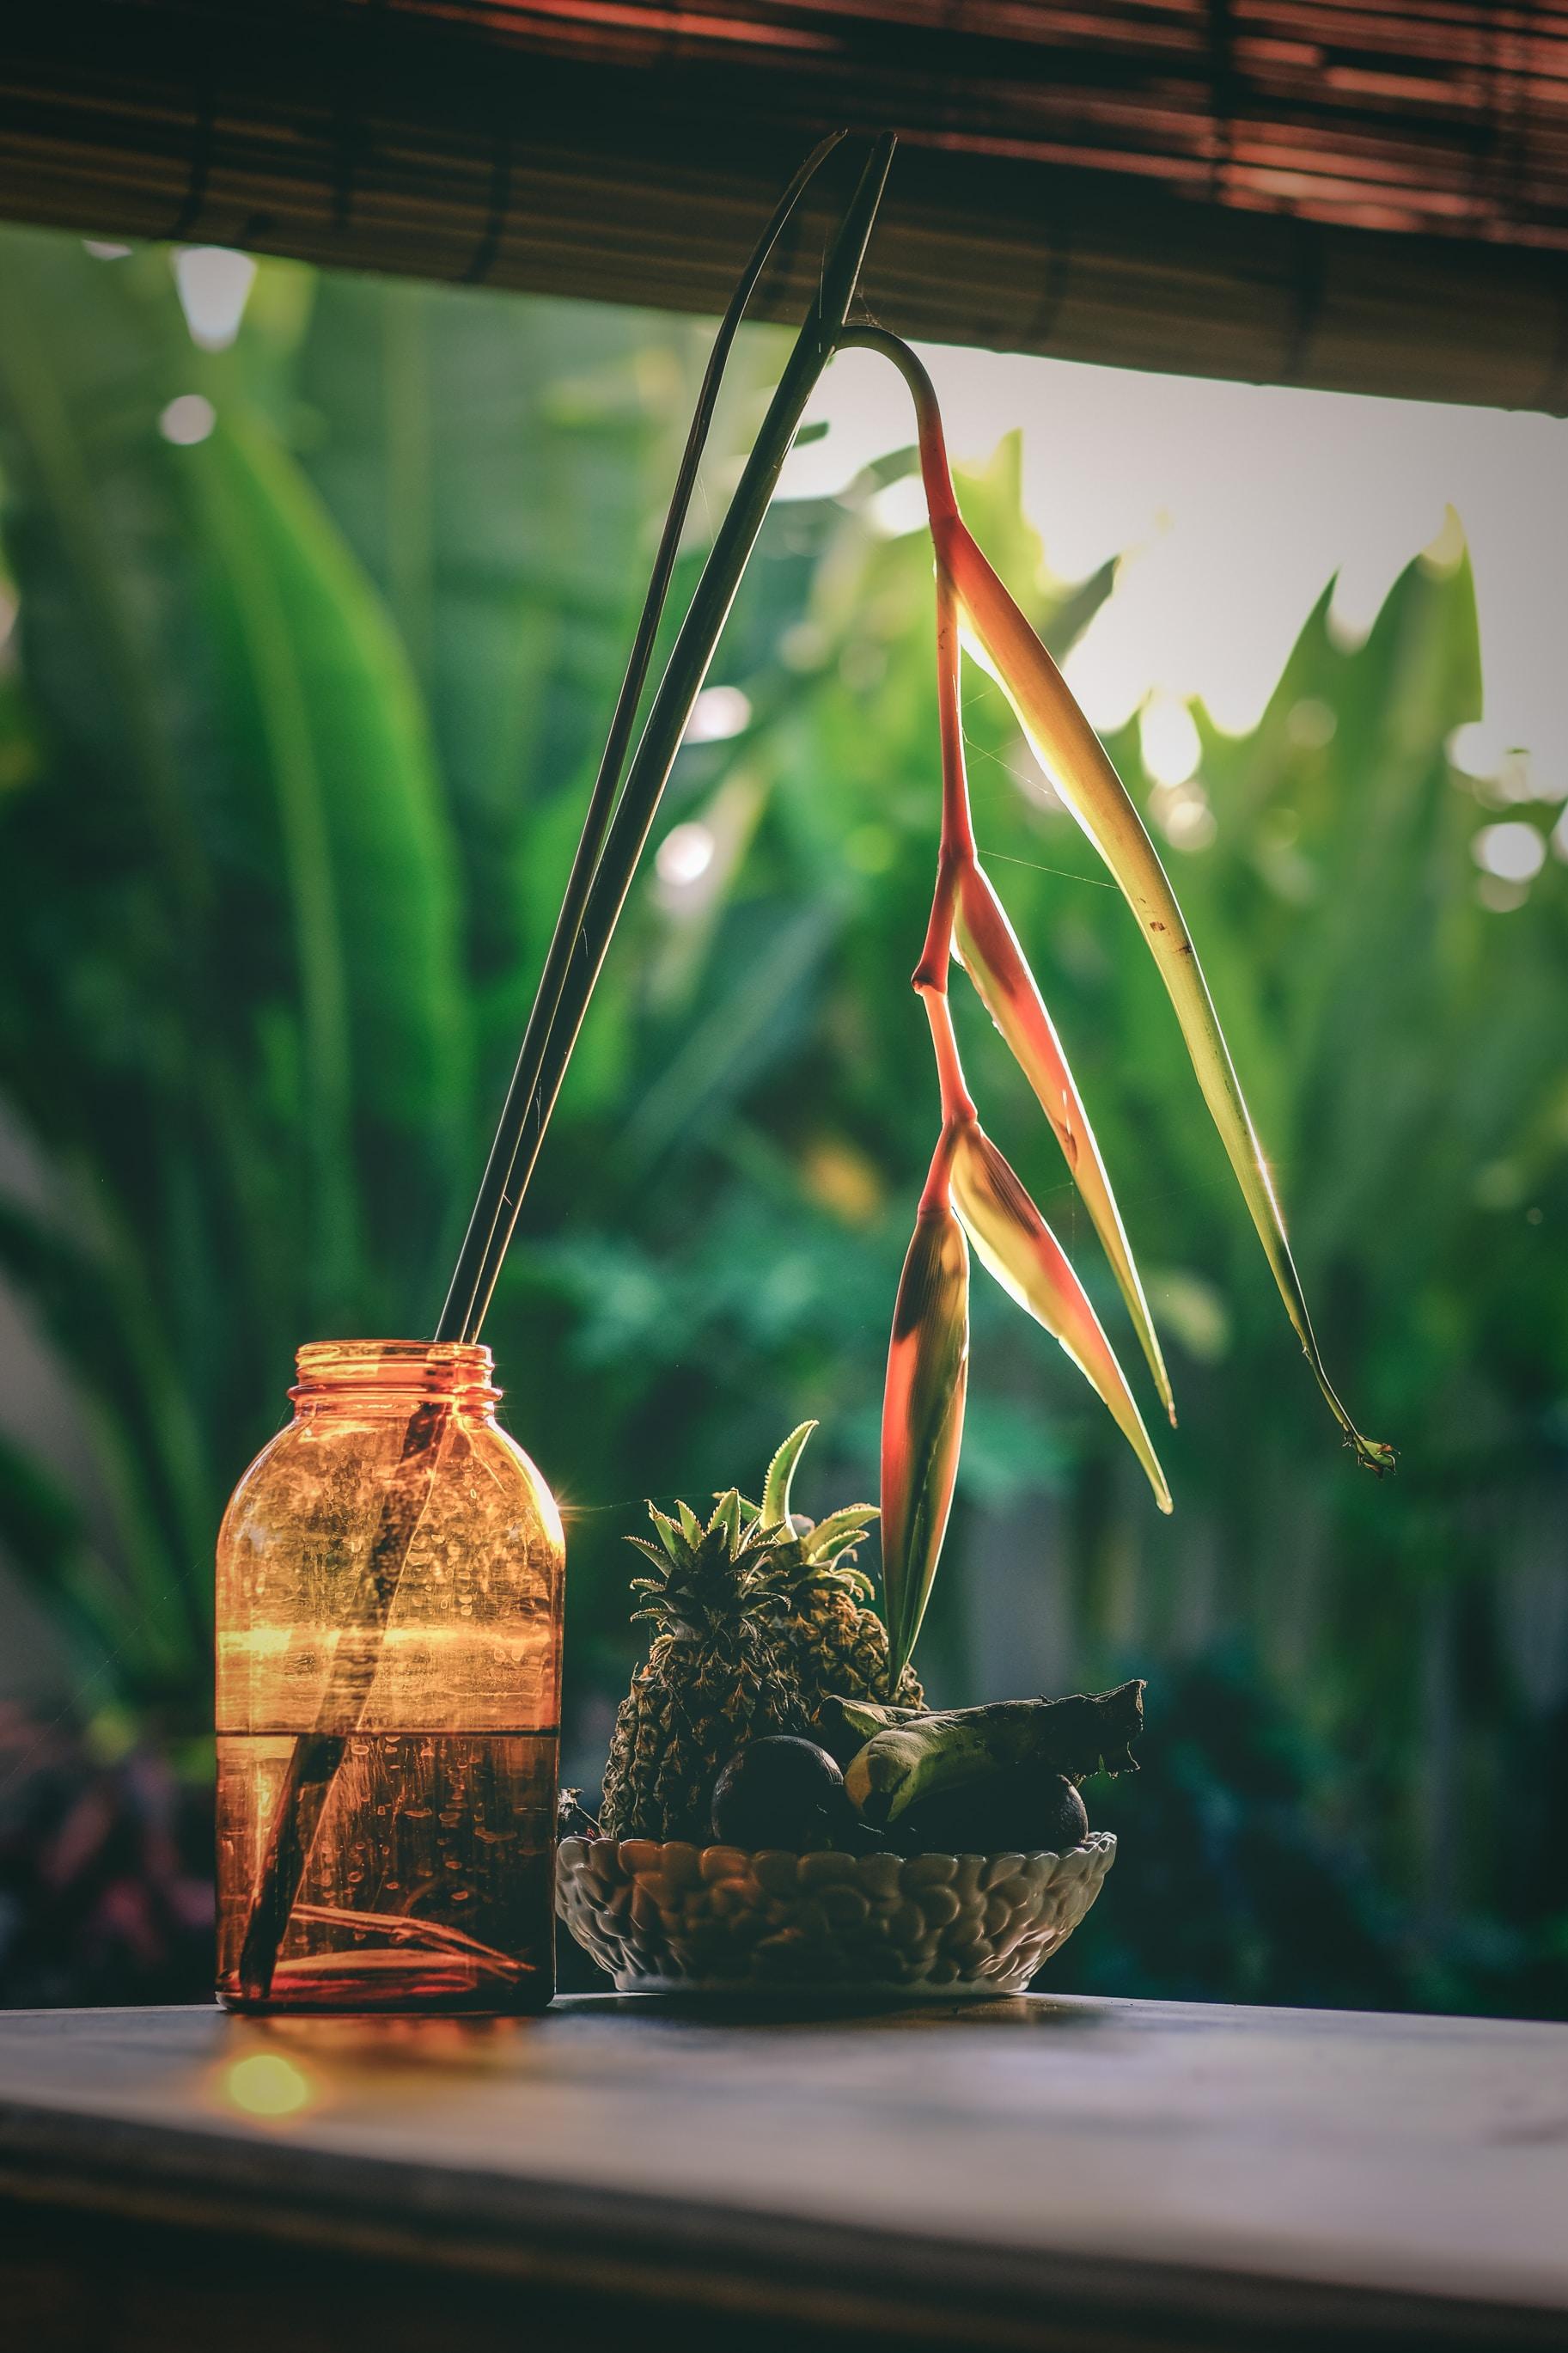 birds of paradise plant on amber glass jar